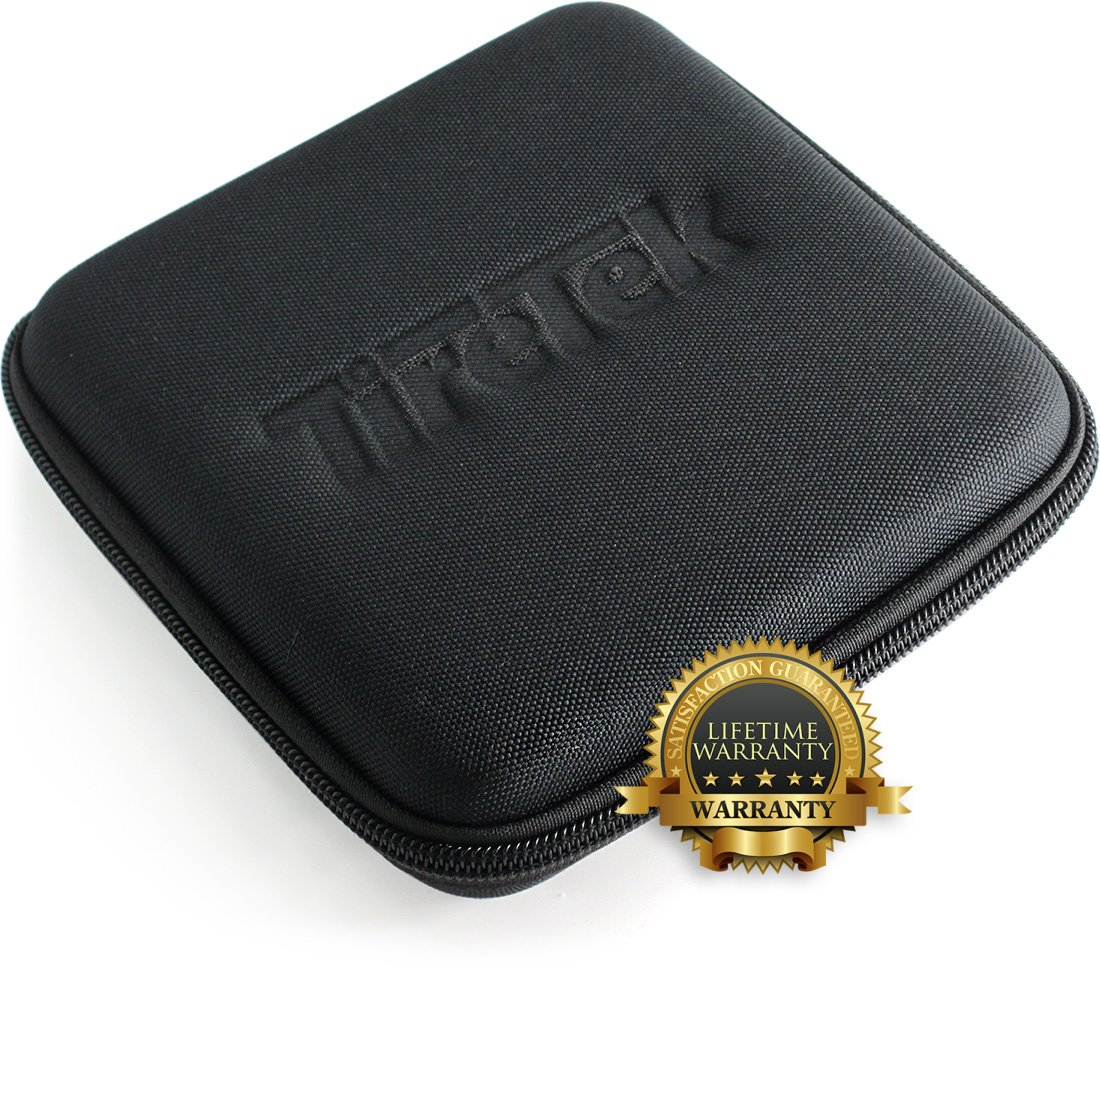 4,1 bares Medidor de presi/ón de neum/áticos de calidad TireTek con v/álvula de retenci/ón integrada